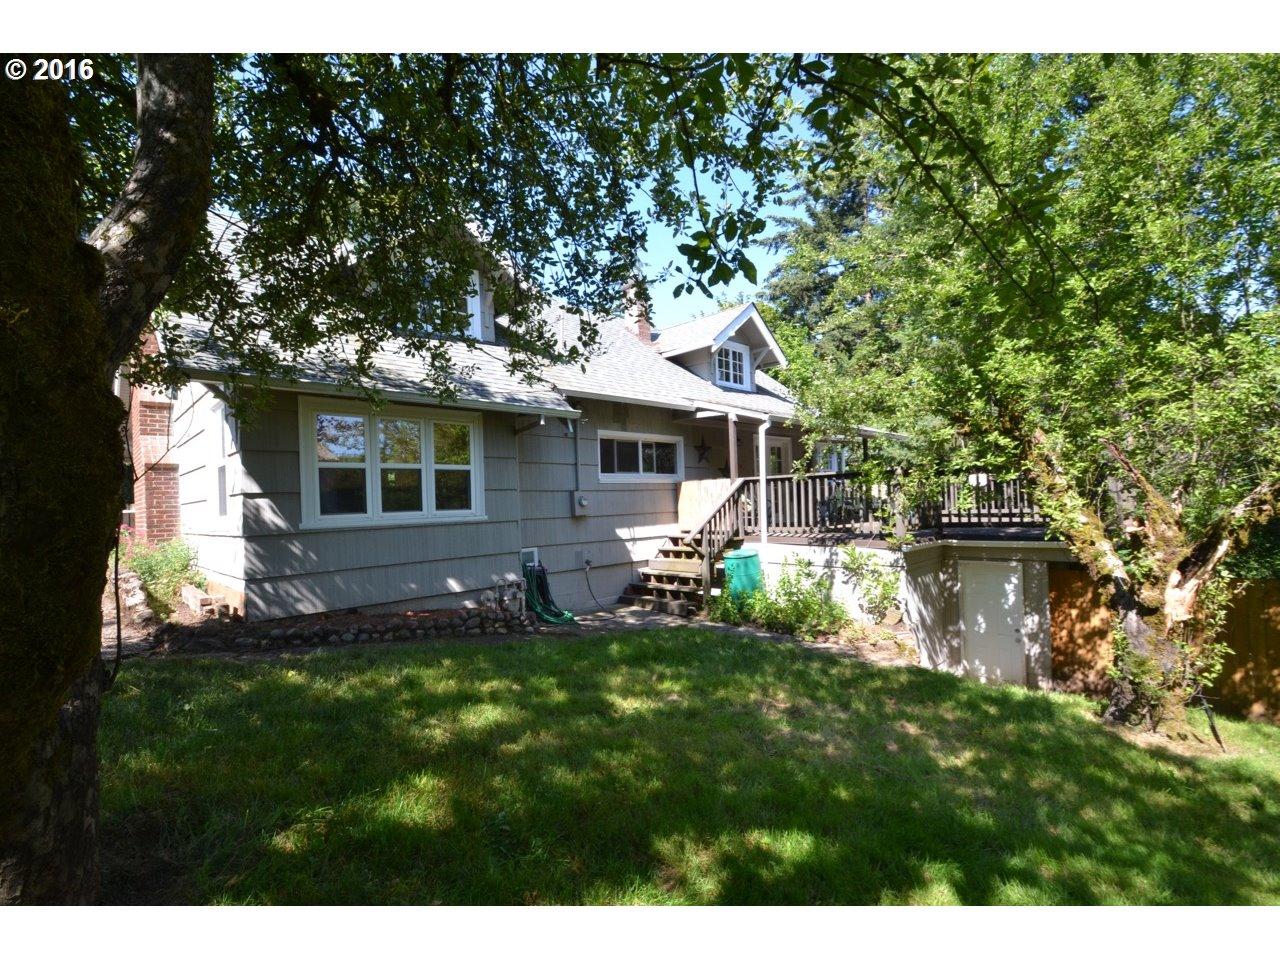 509 HARRISON ST, Oregon City, OR 97045